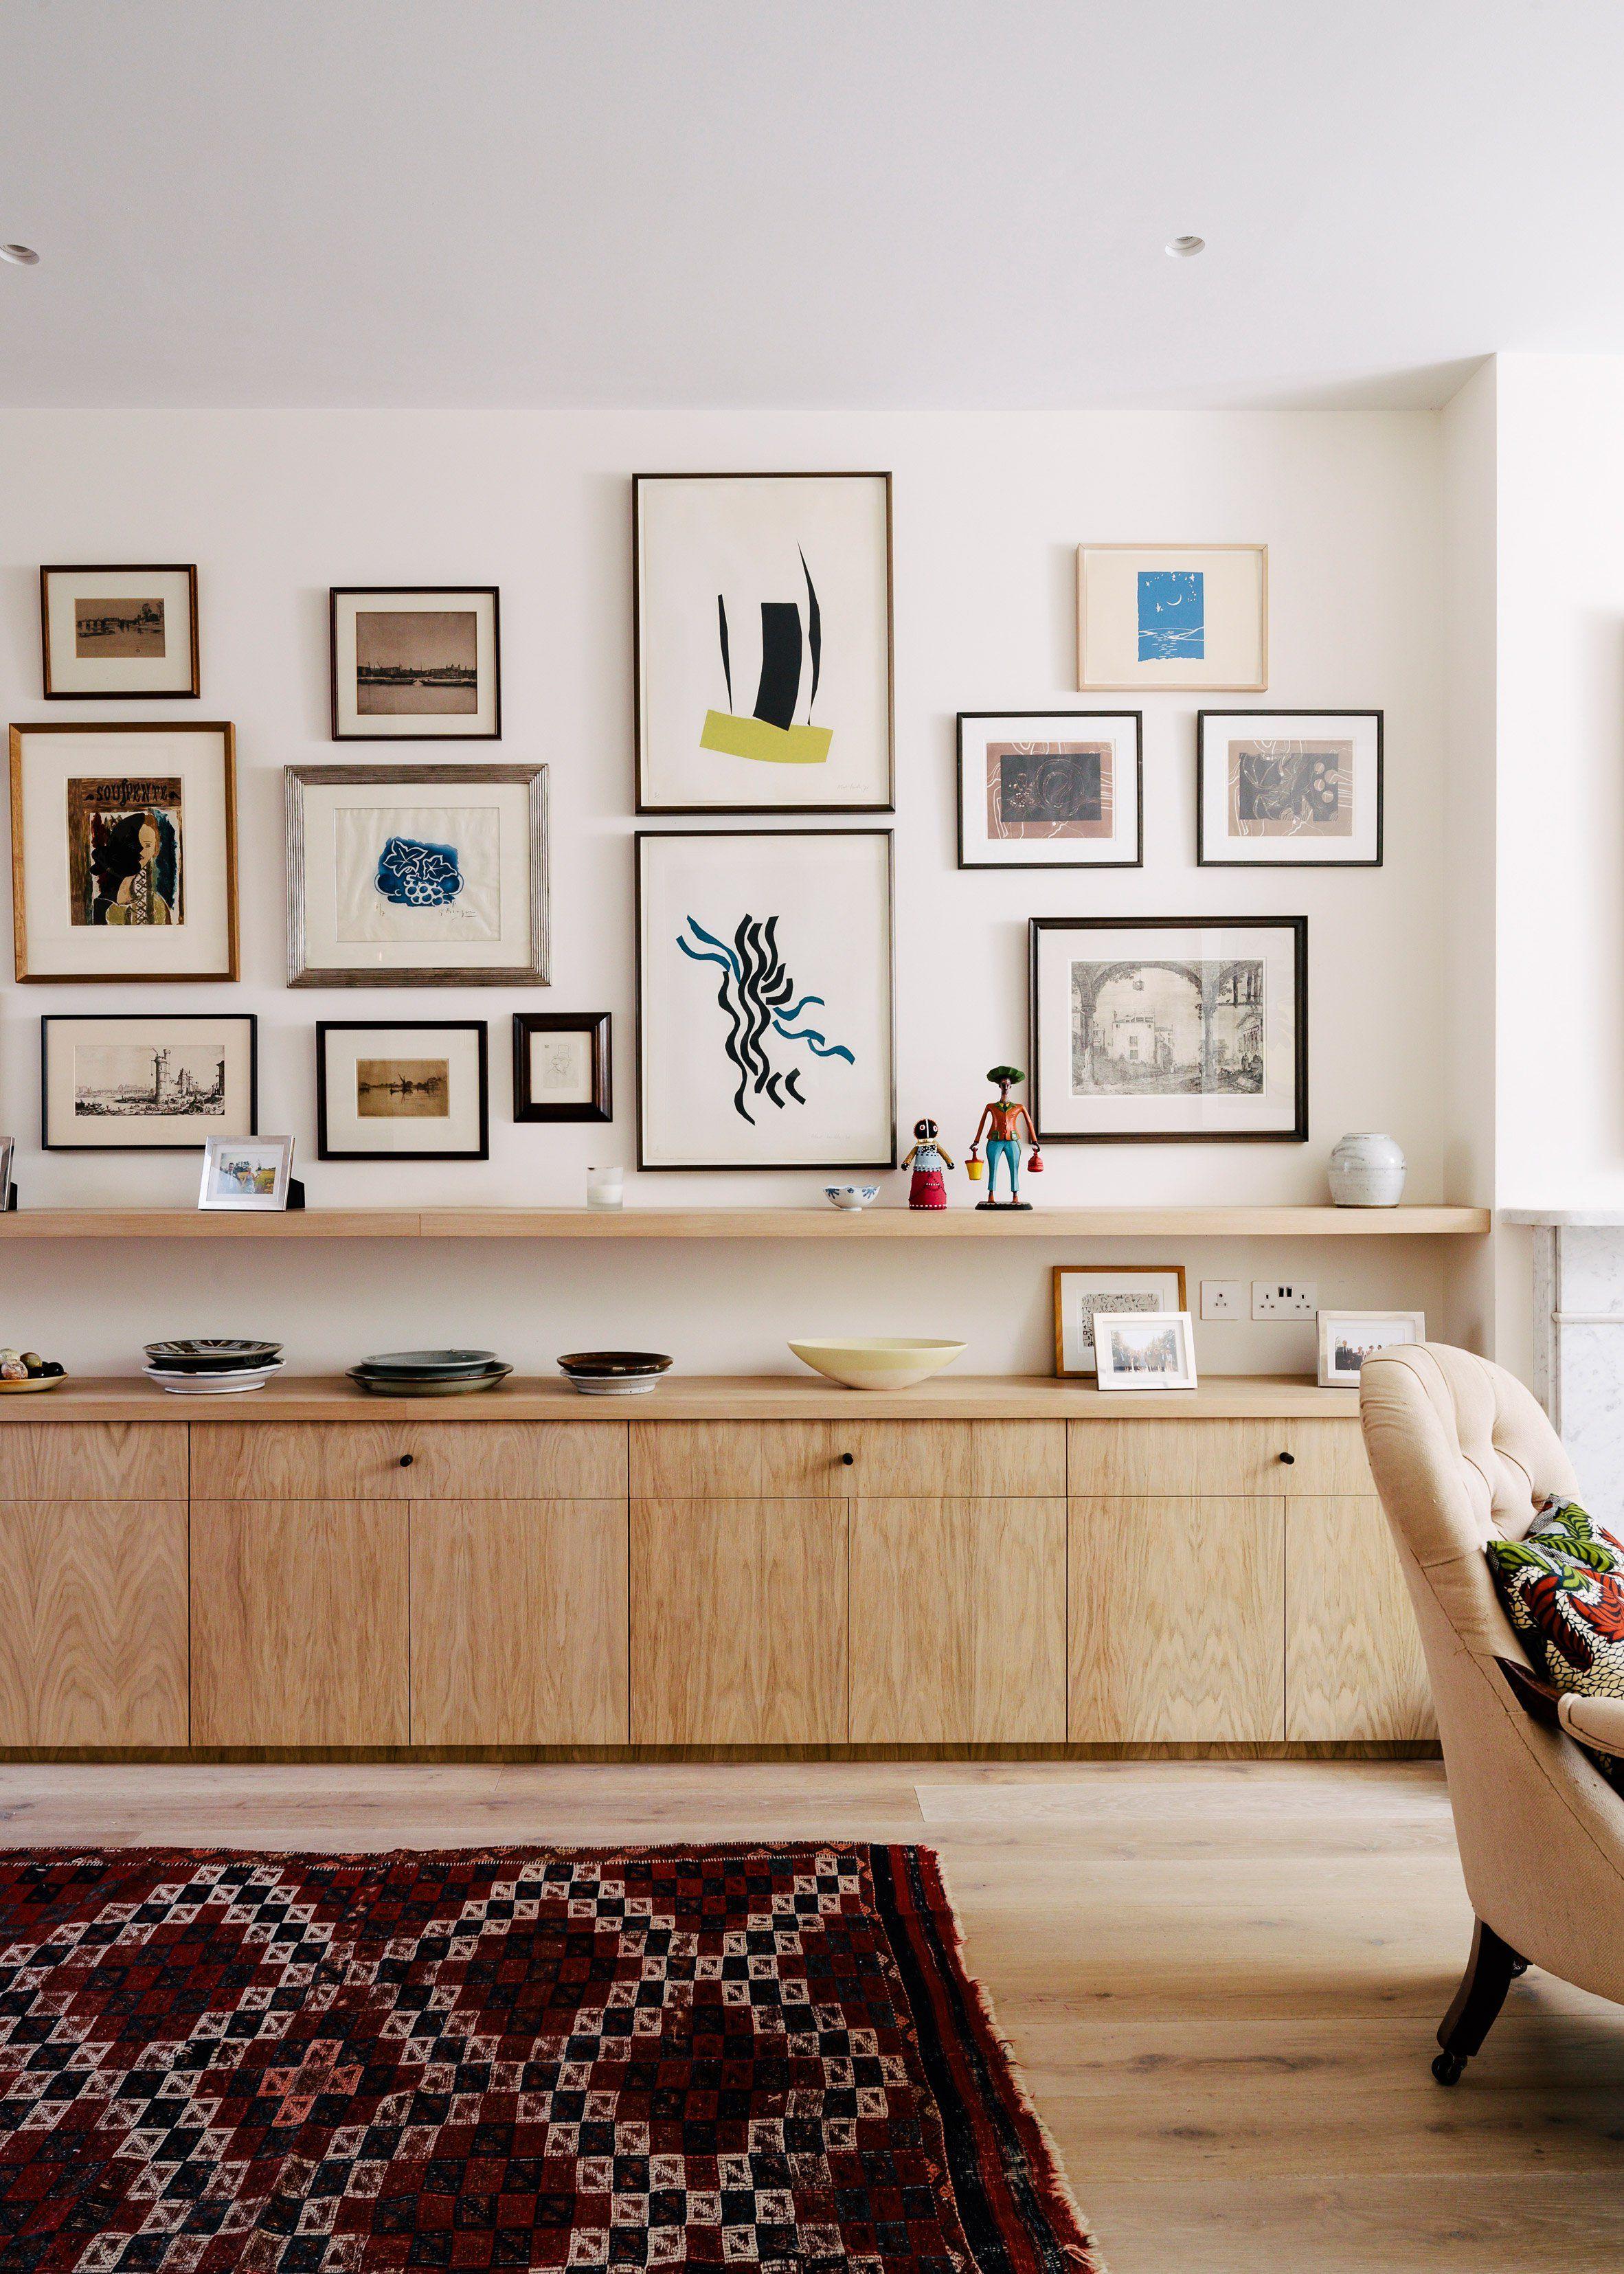 Gallery House Stoke Newington Neil Dusheiko Architects Living